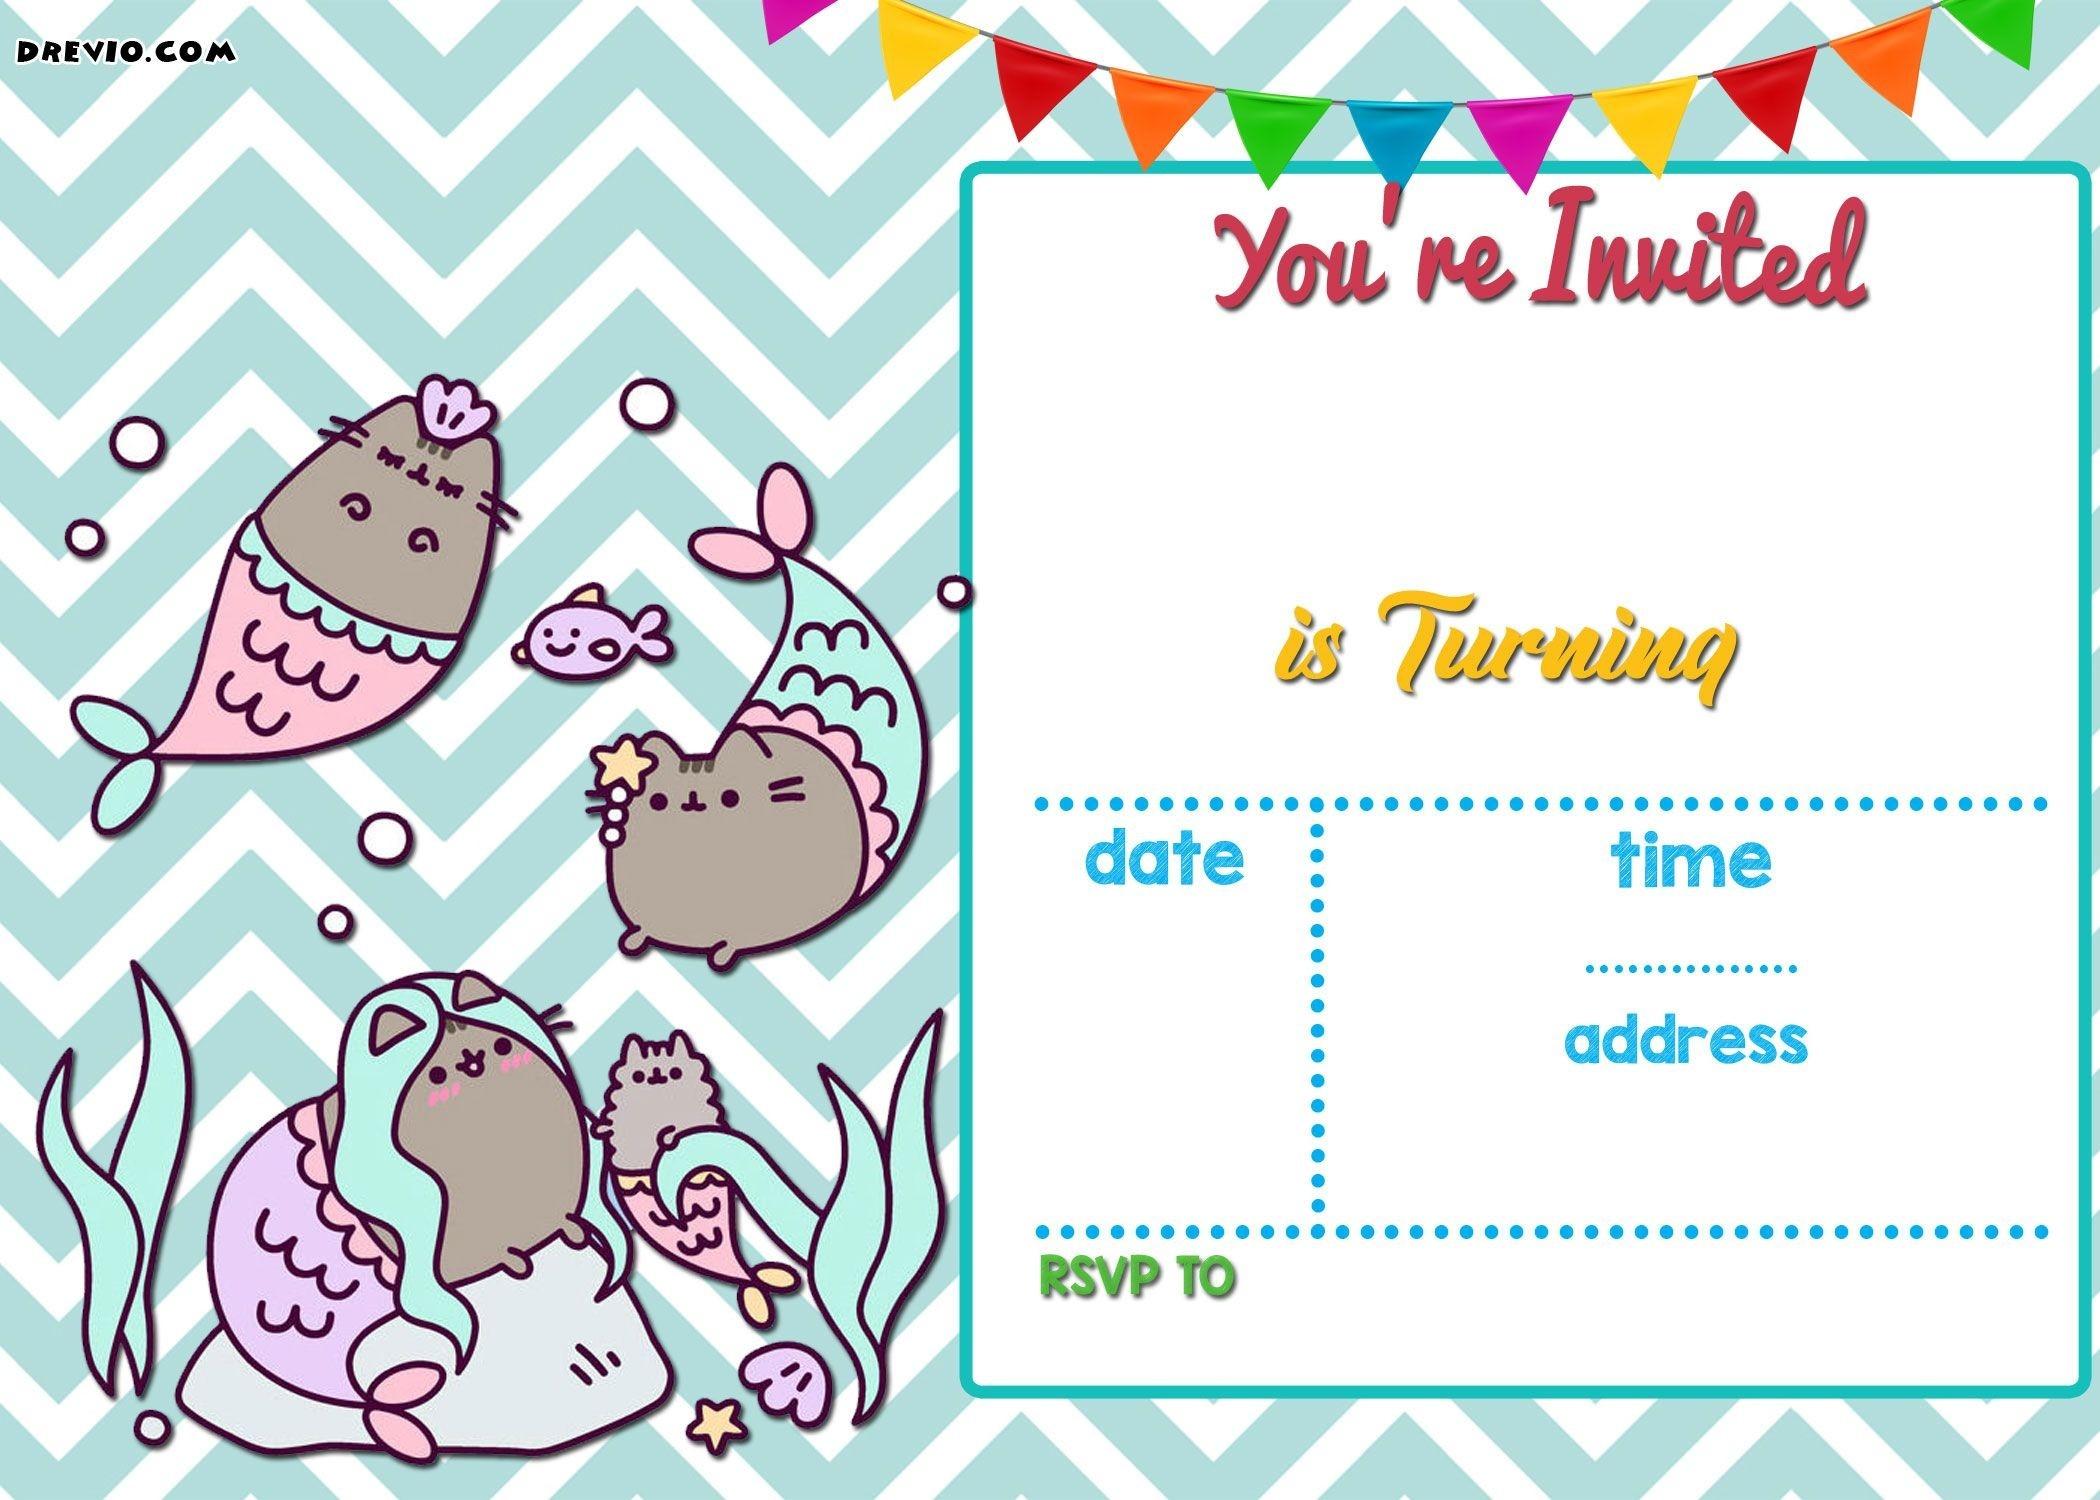 Free Mermaid Pusheen Invitation Templates Free Printable Birthday - Free Printable Birthday Party Invitations With Photo